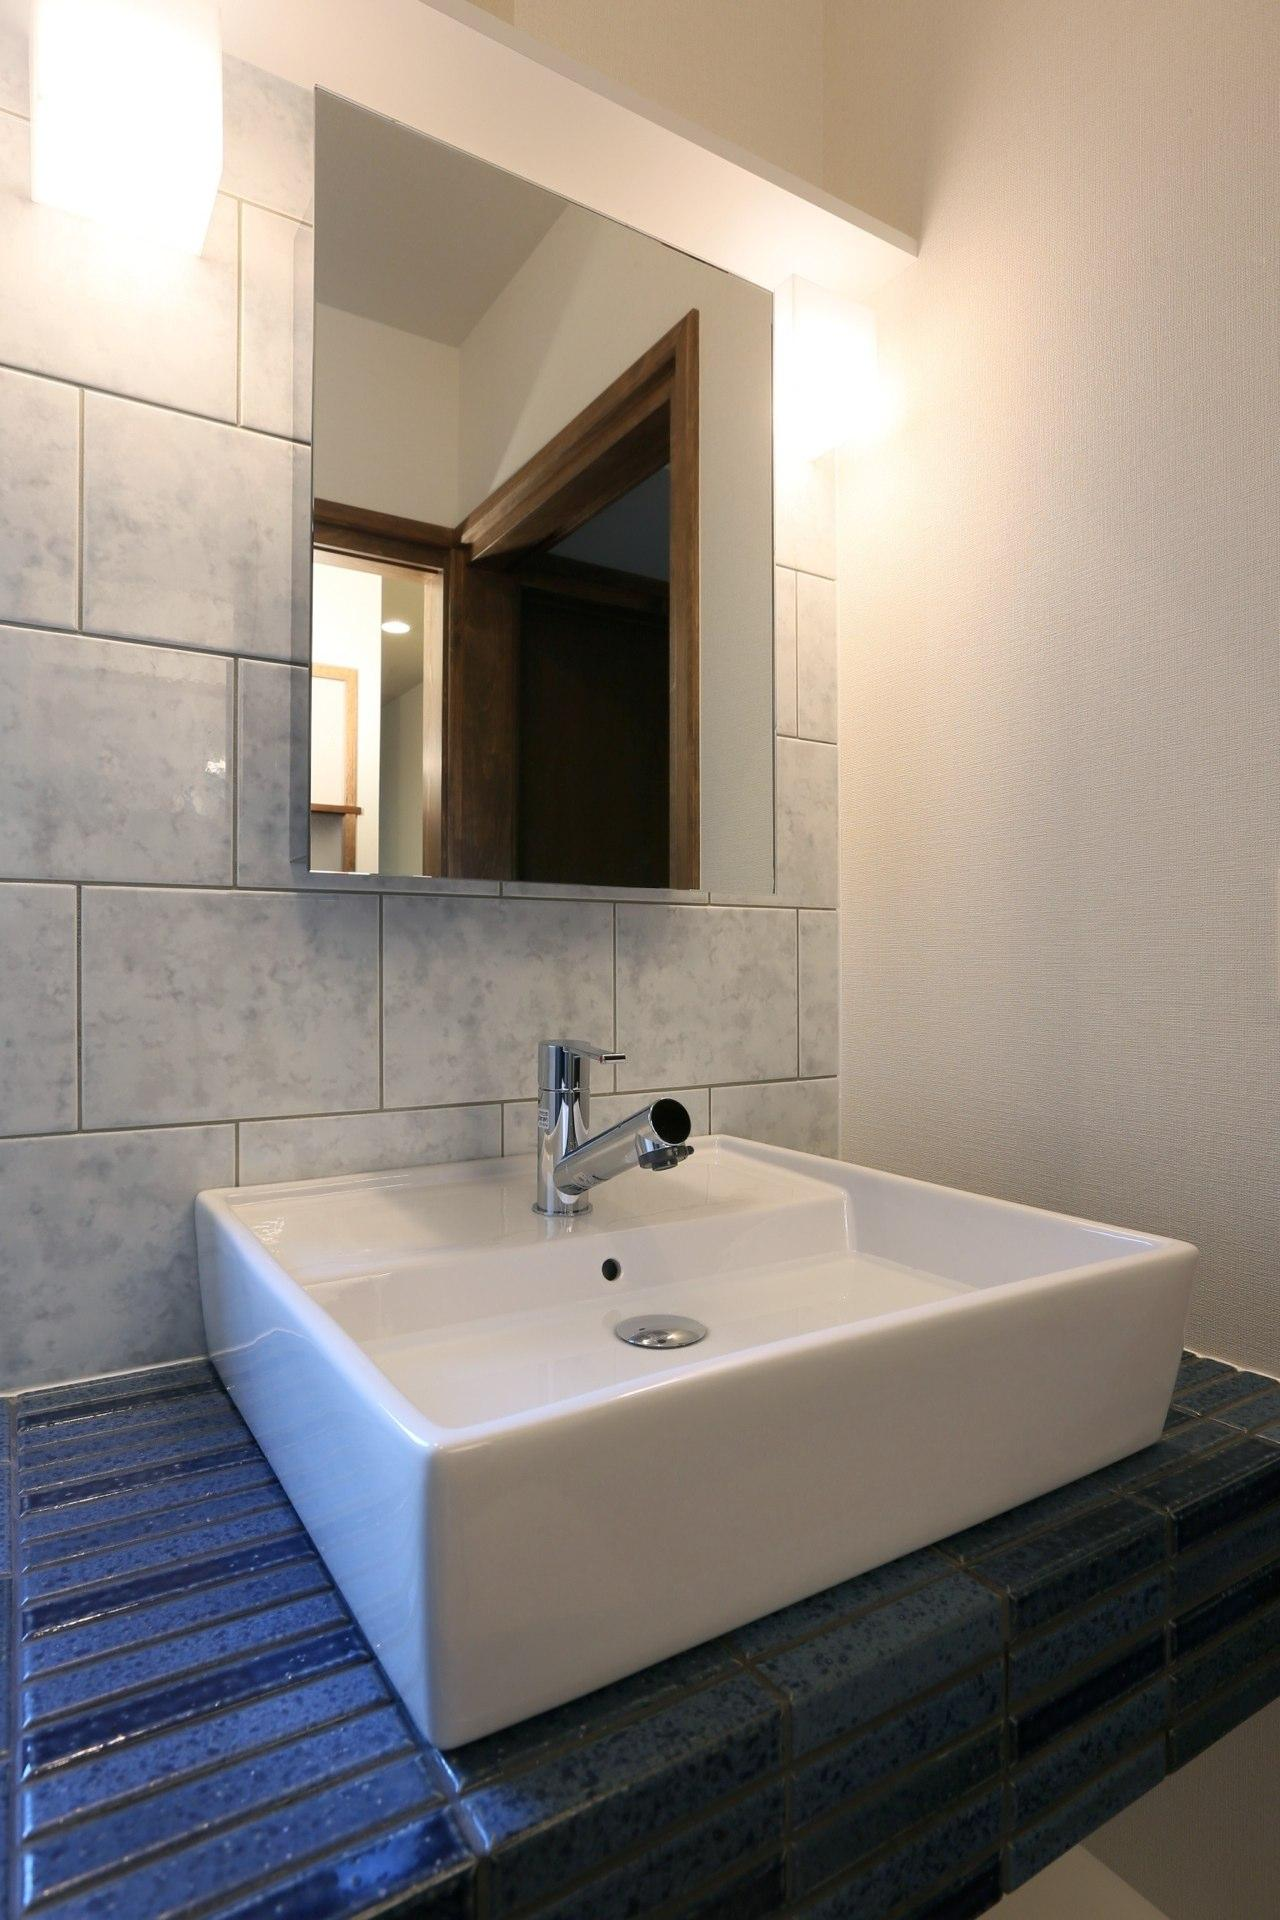 K's residenceの部屋 洗面所-ブルーのボーダータイルの洗面台